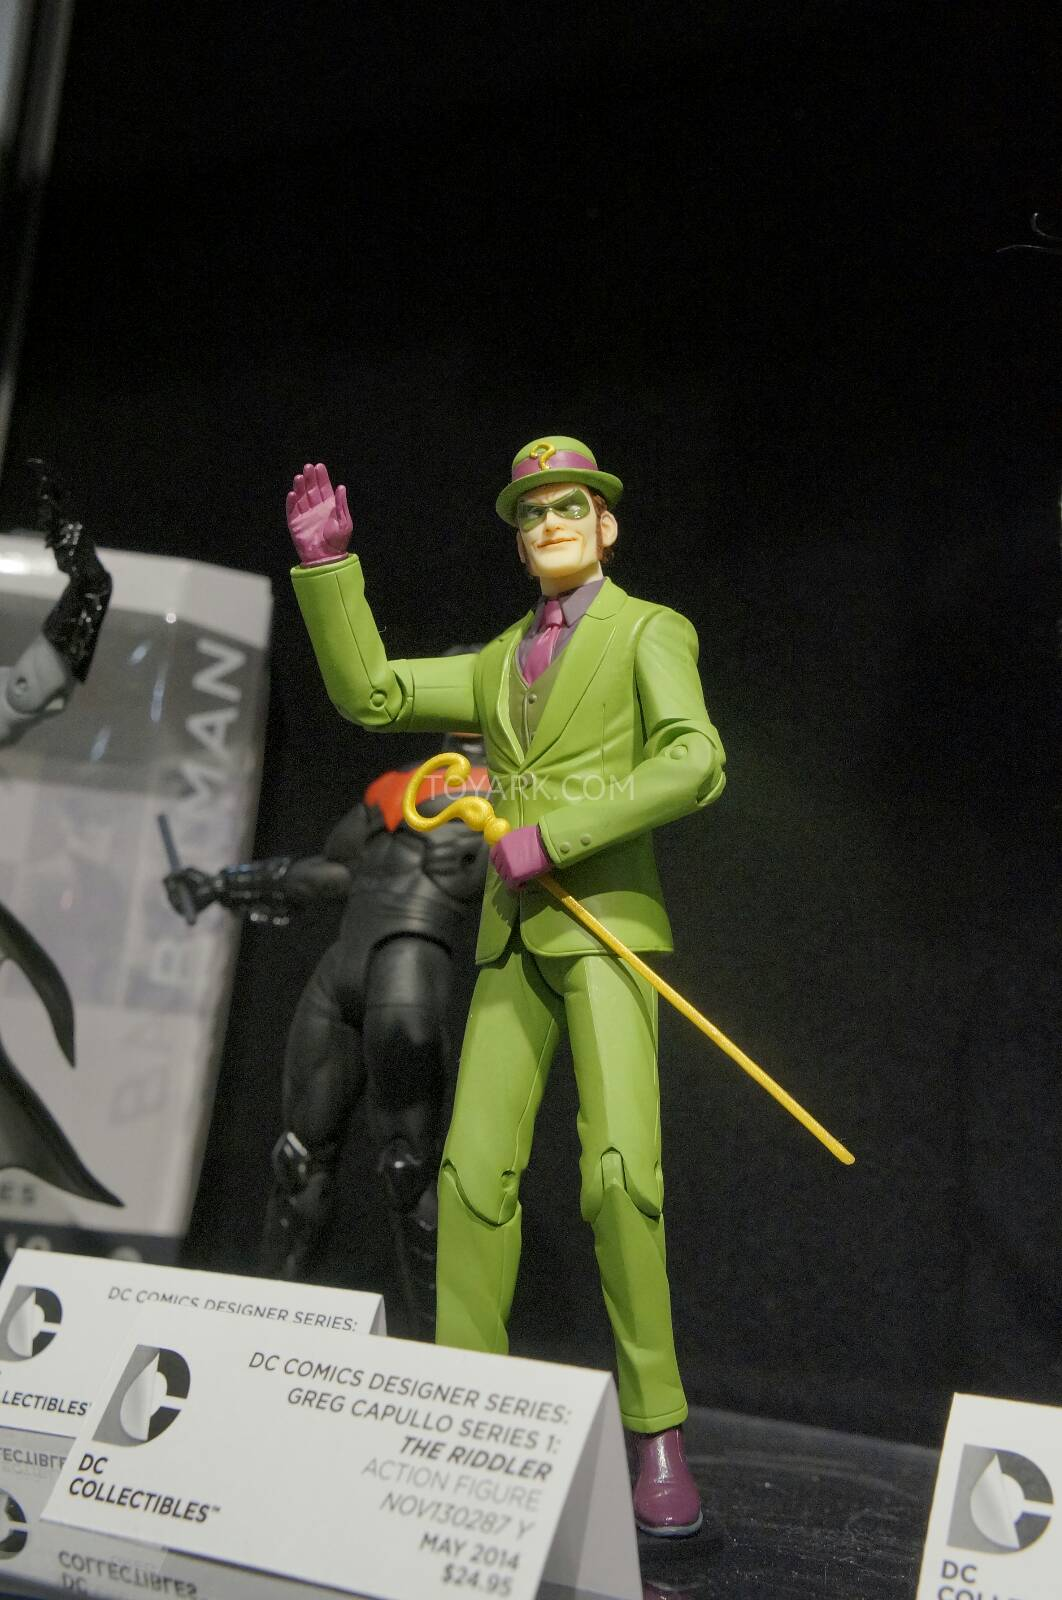 [Toy Fair 2014] DC Collectibles Toy-Fair-2014-DC-Collectibles-092